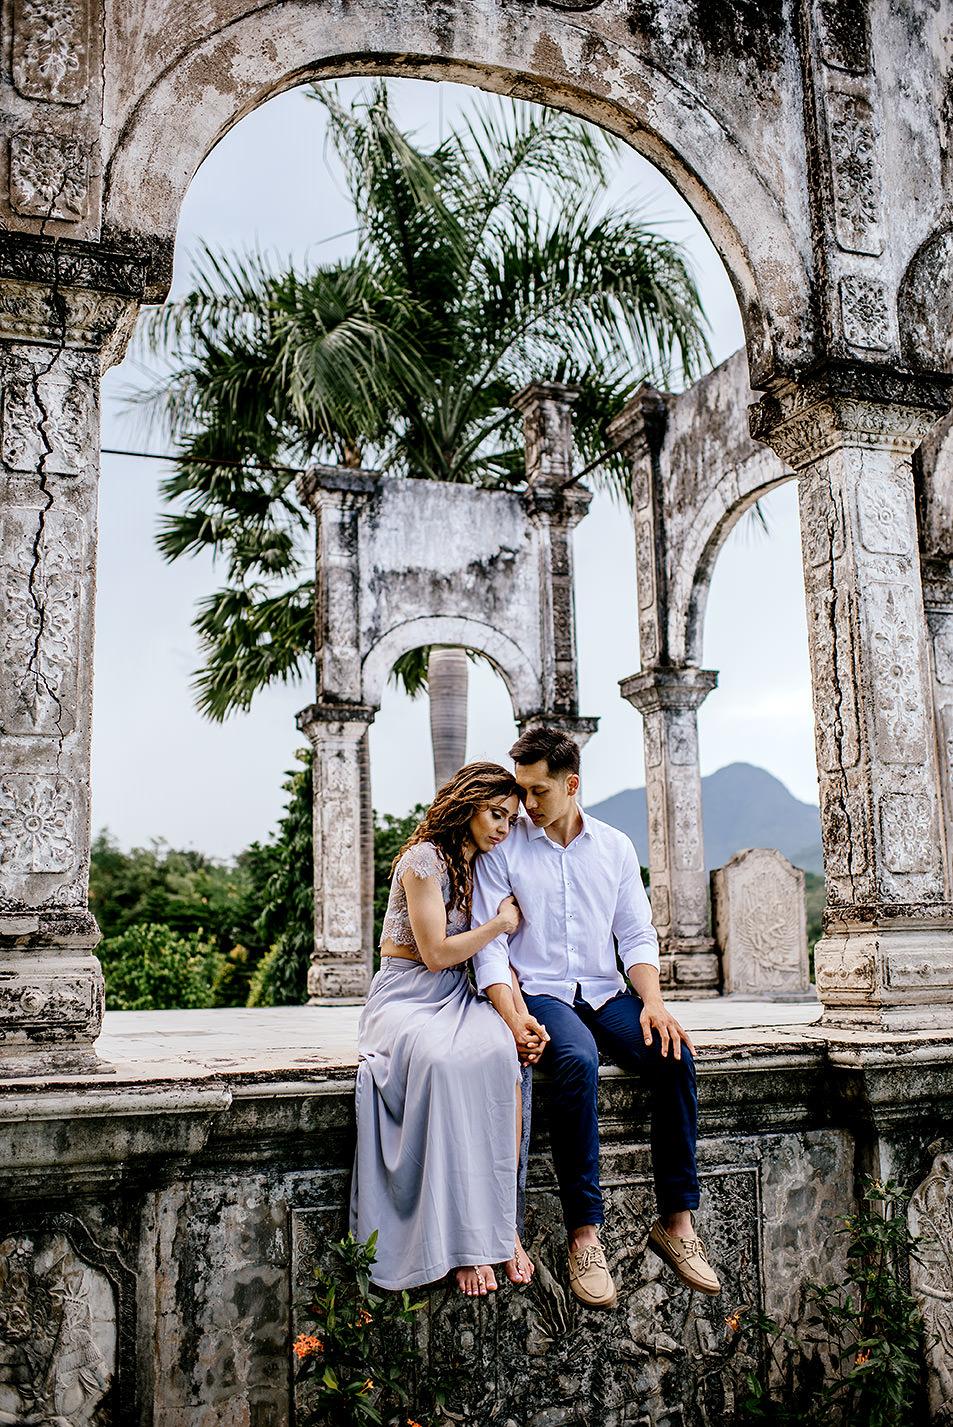 Bali-temple-engagment-Bali-wedding-photographer44.jpg